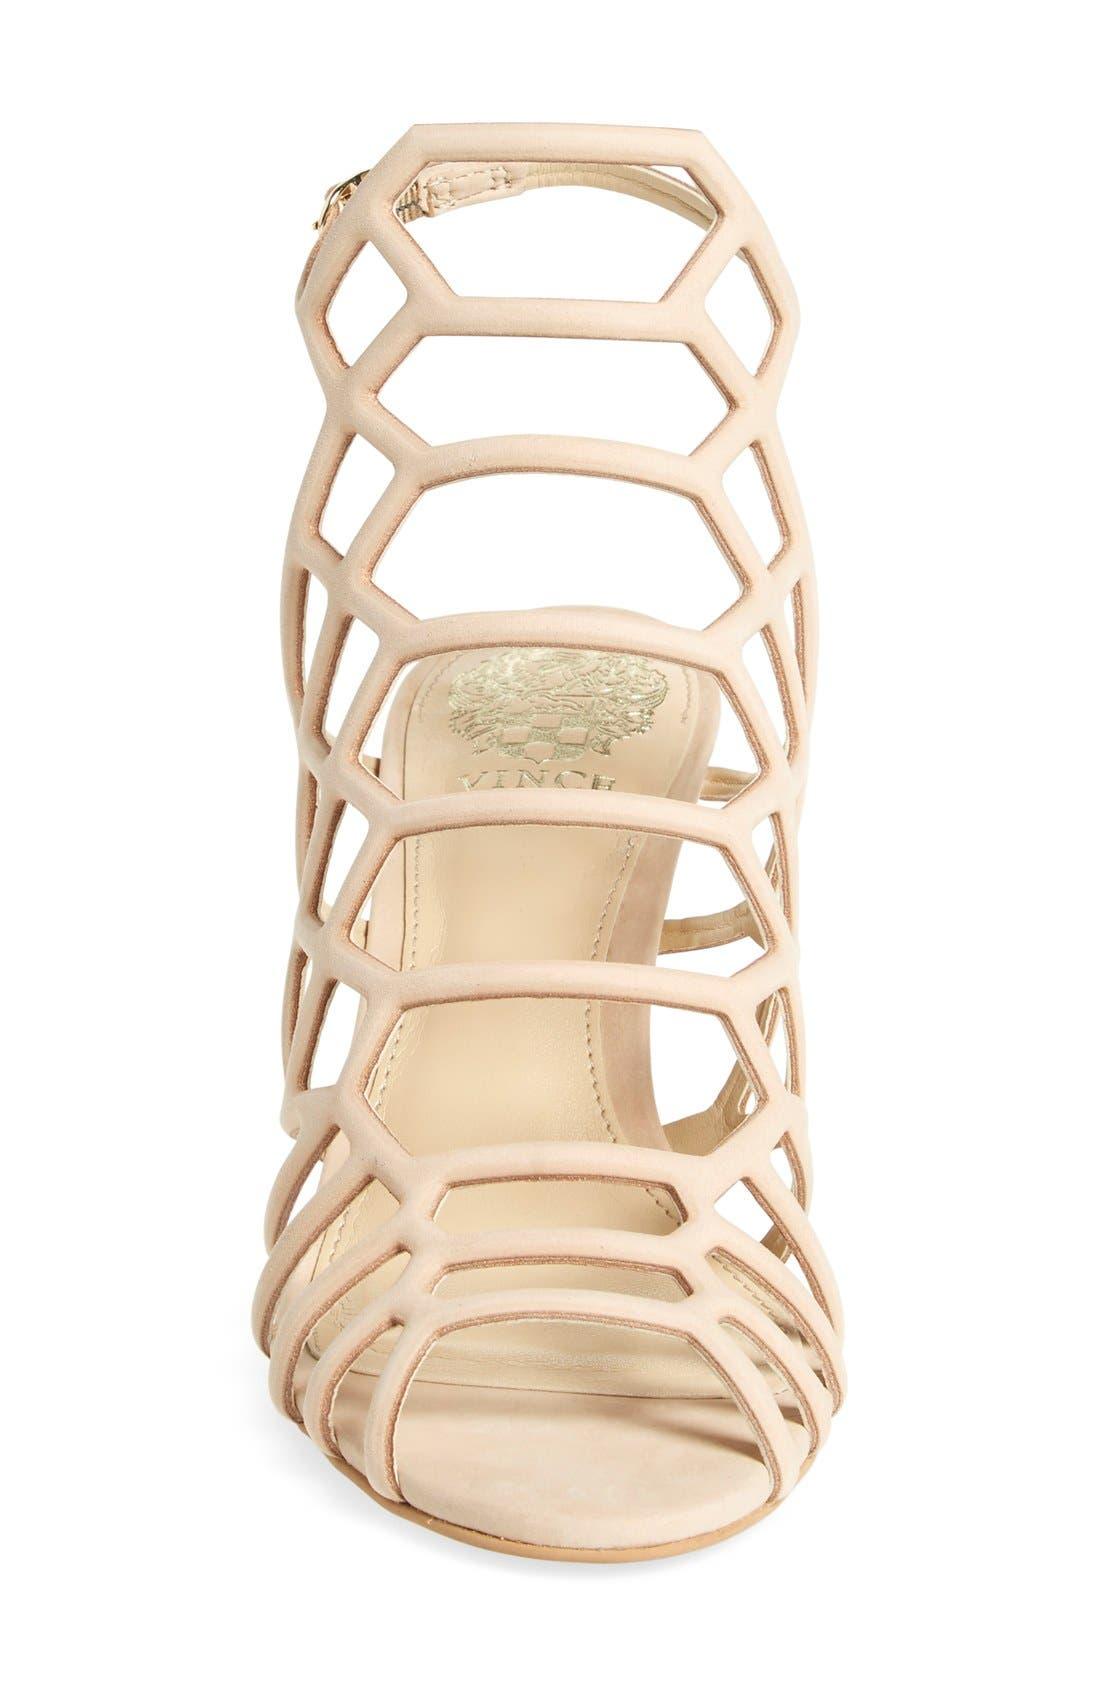 Alternate Image 3  - Vince Camuto 'Paxton' Slingback Sandal (Women)